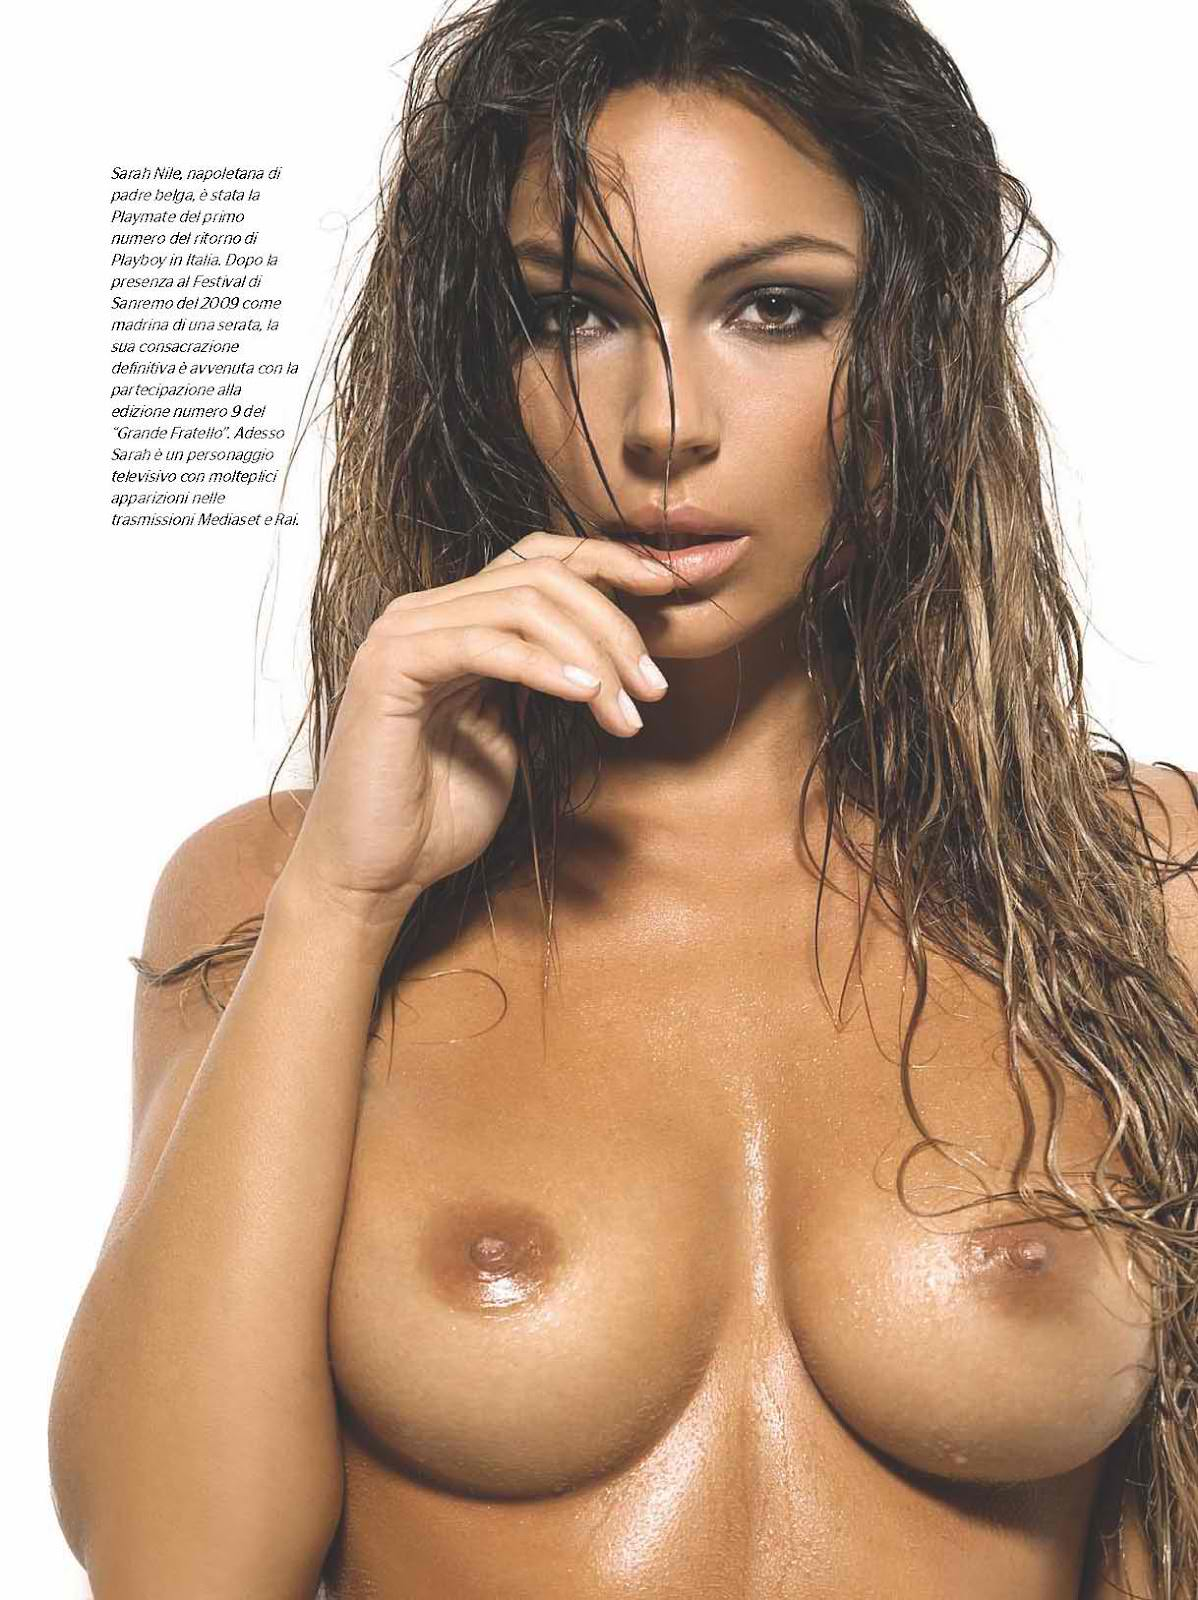 Pictures Of Sarah Nile Francesca Lukasik Federica Ariafina At Playboy